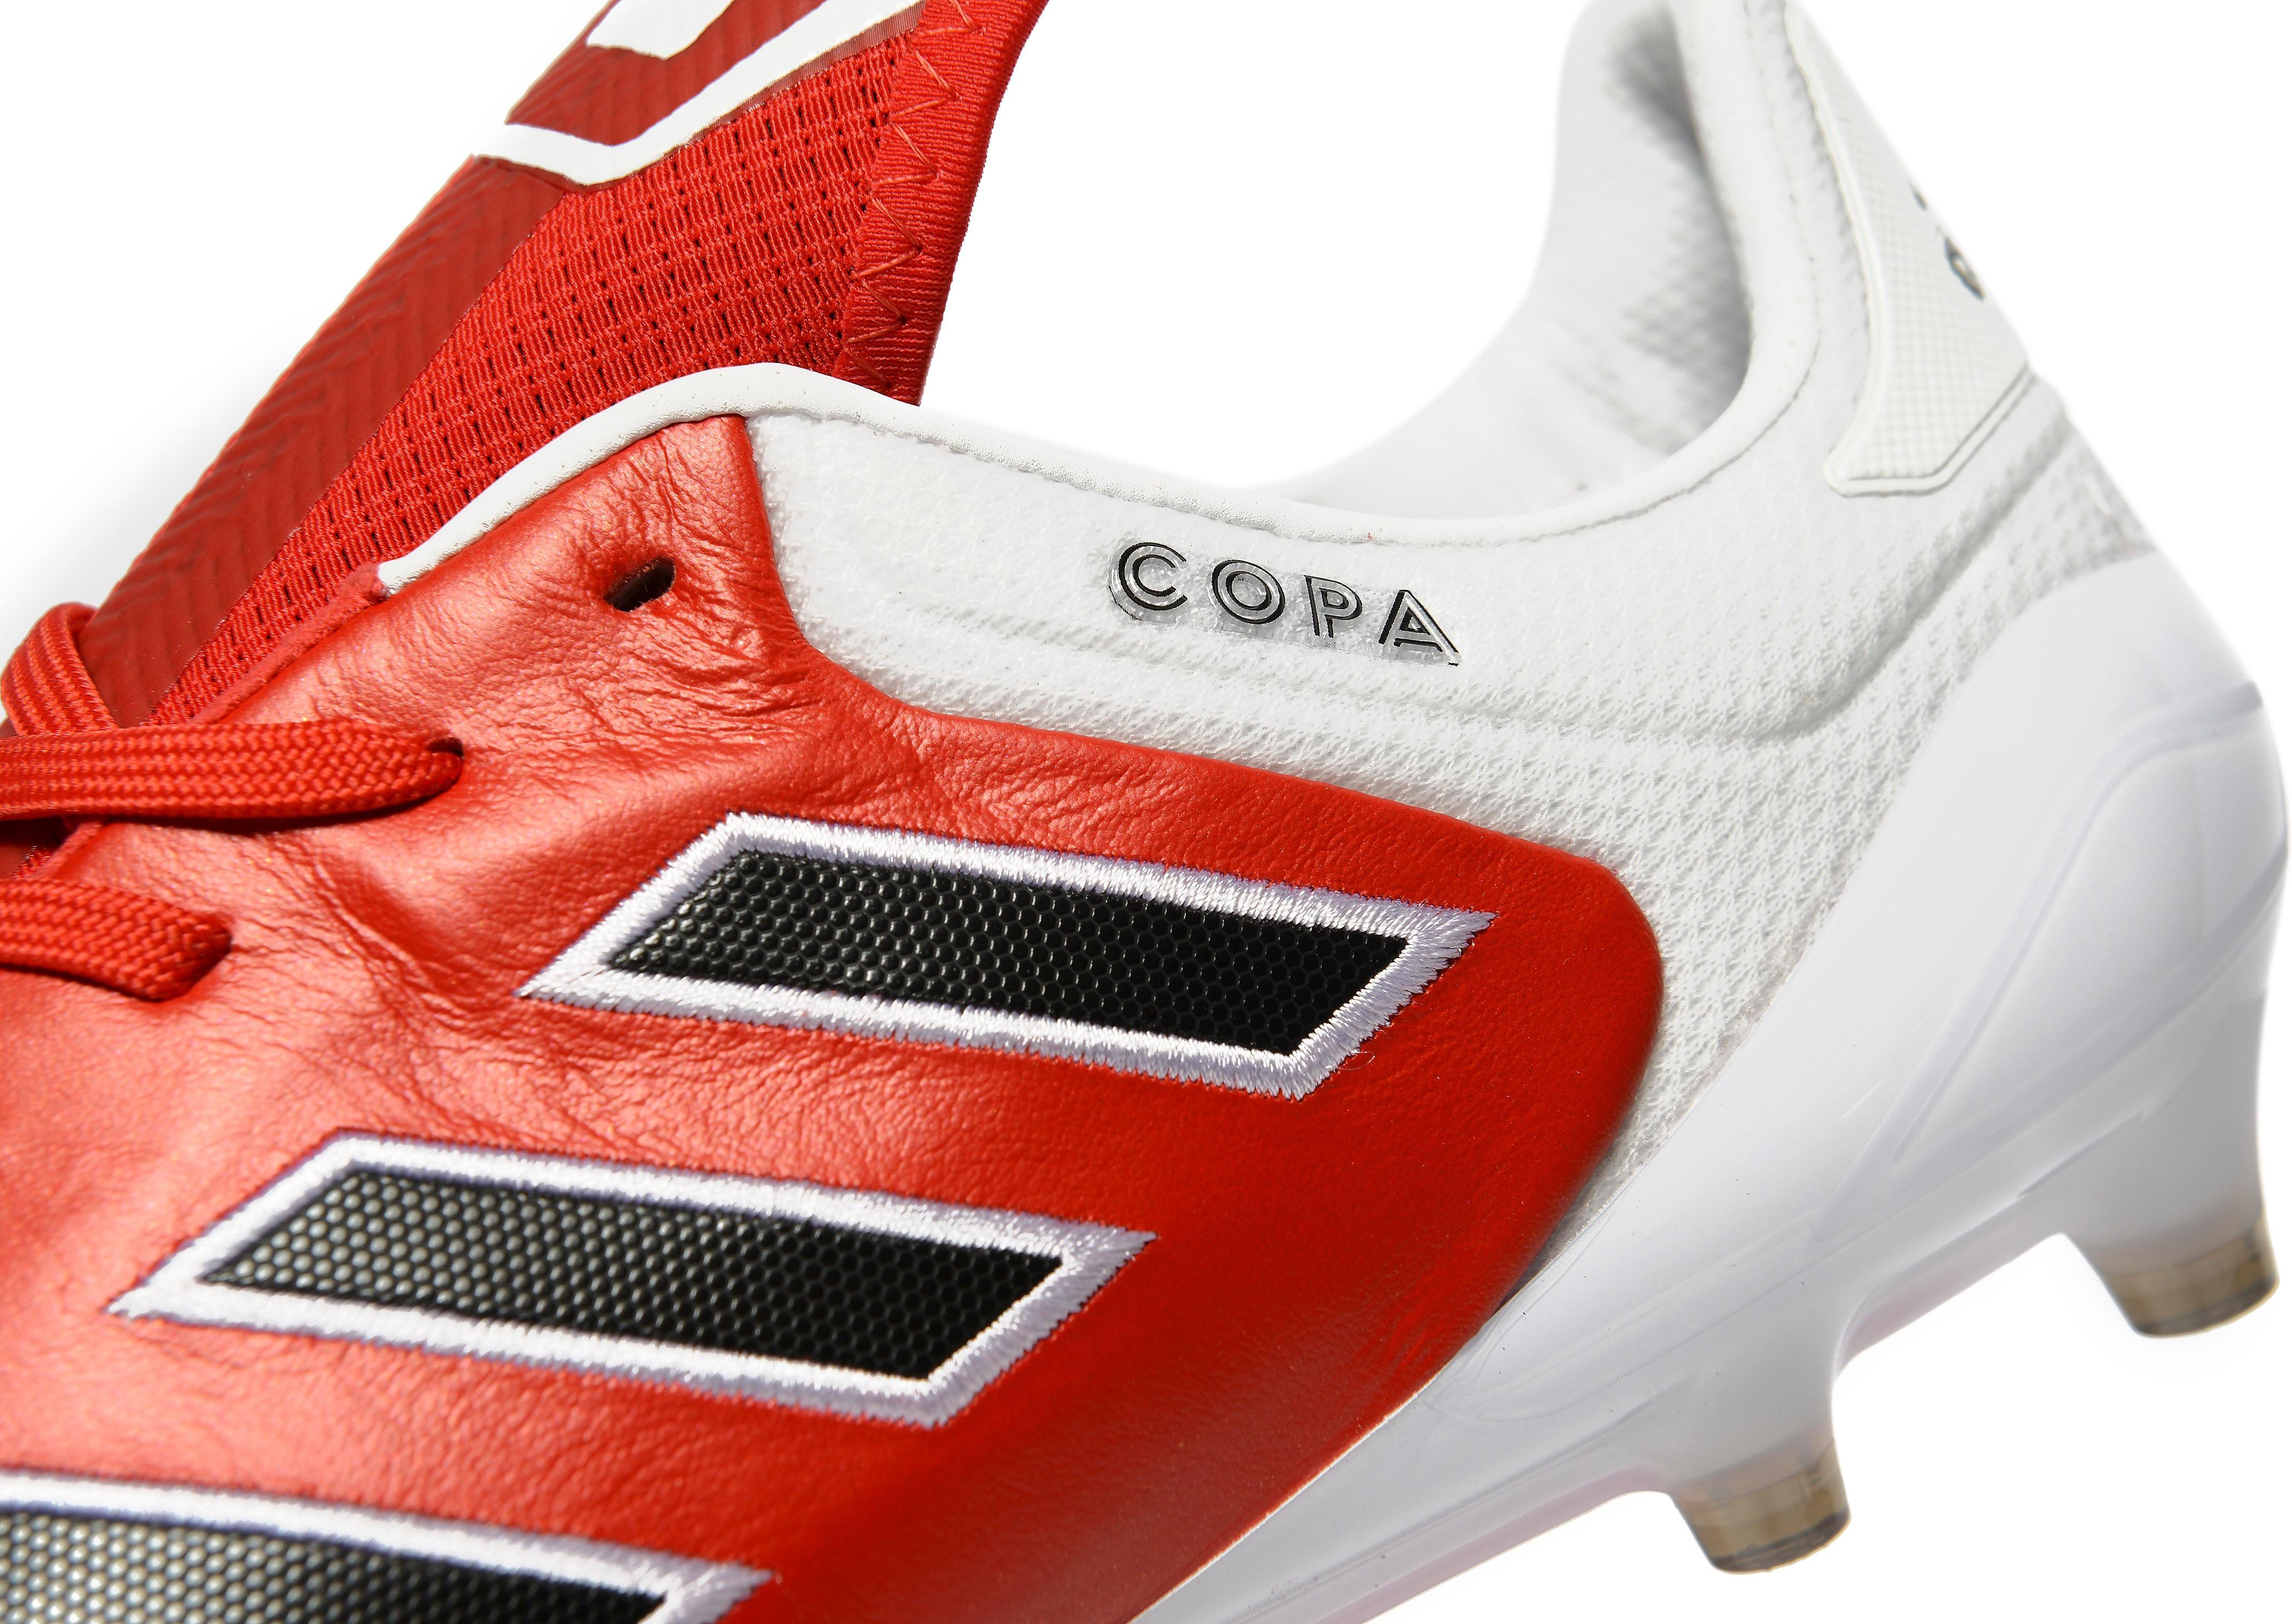 adidas Red Limit Copa 17.1 FG